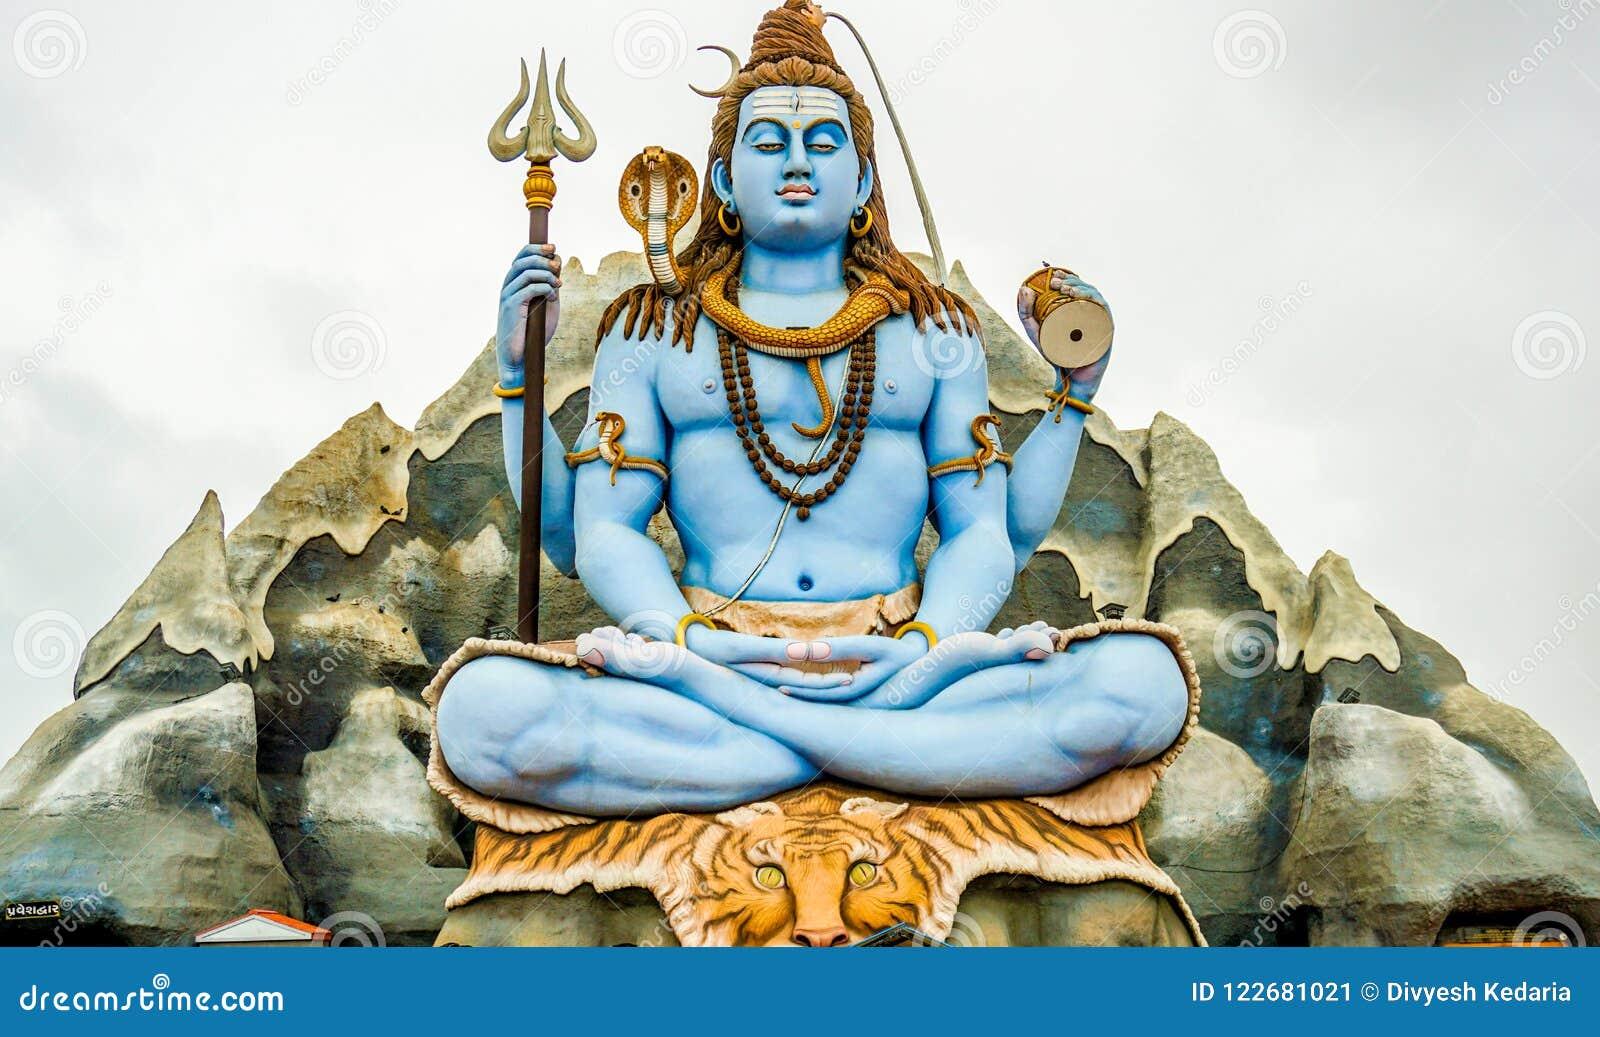 40 410 Shiva Photos Free Royalty Free Stock Photos From Dreamstime